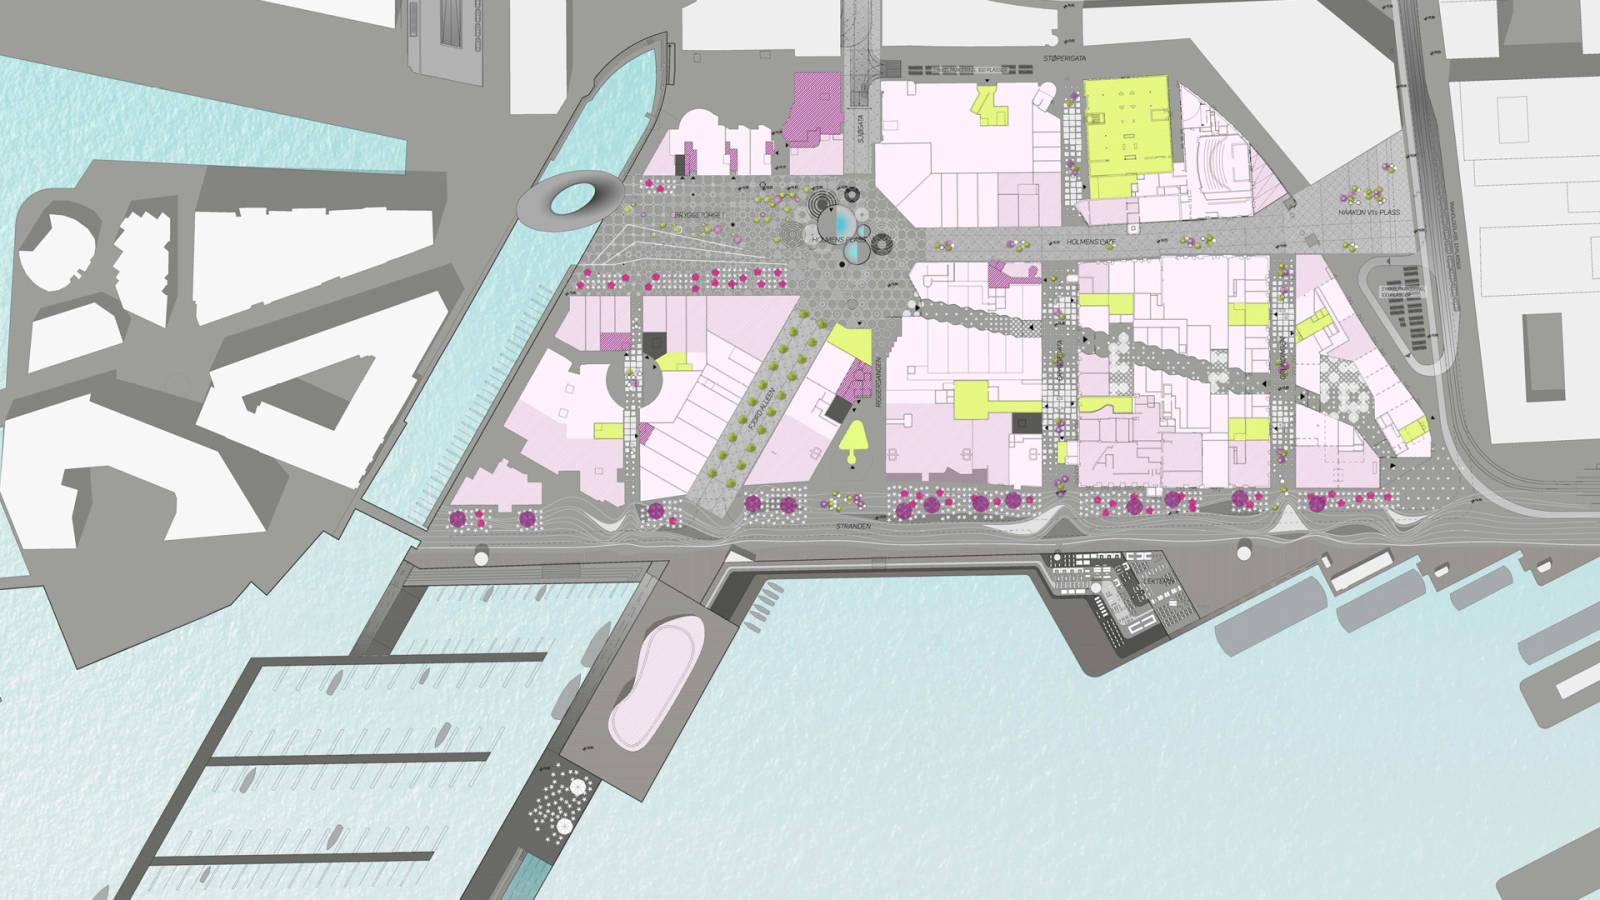 PLAN - Aker Brygge Masterplan - SPOL Architects